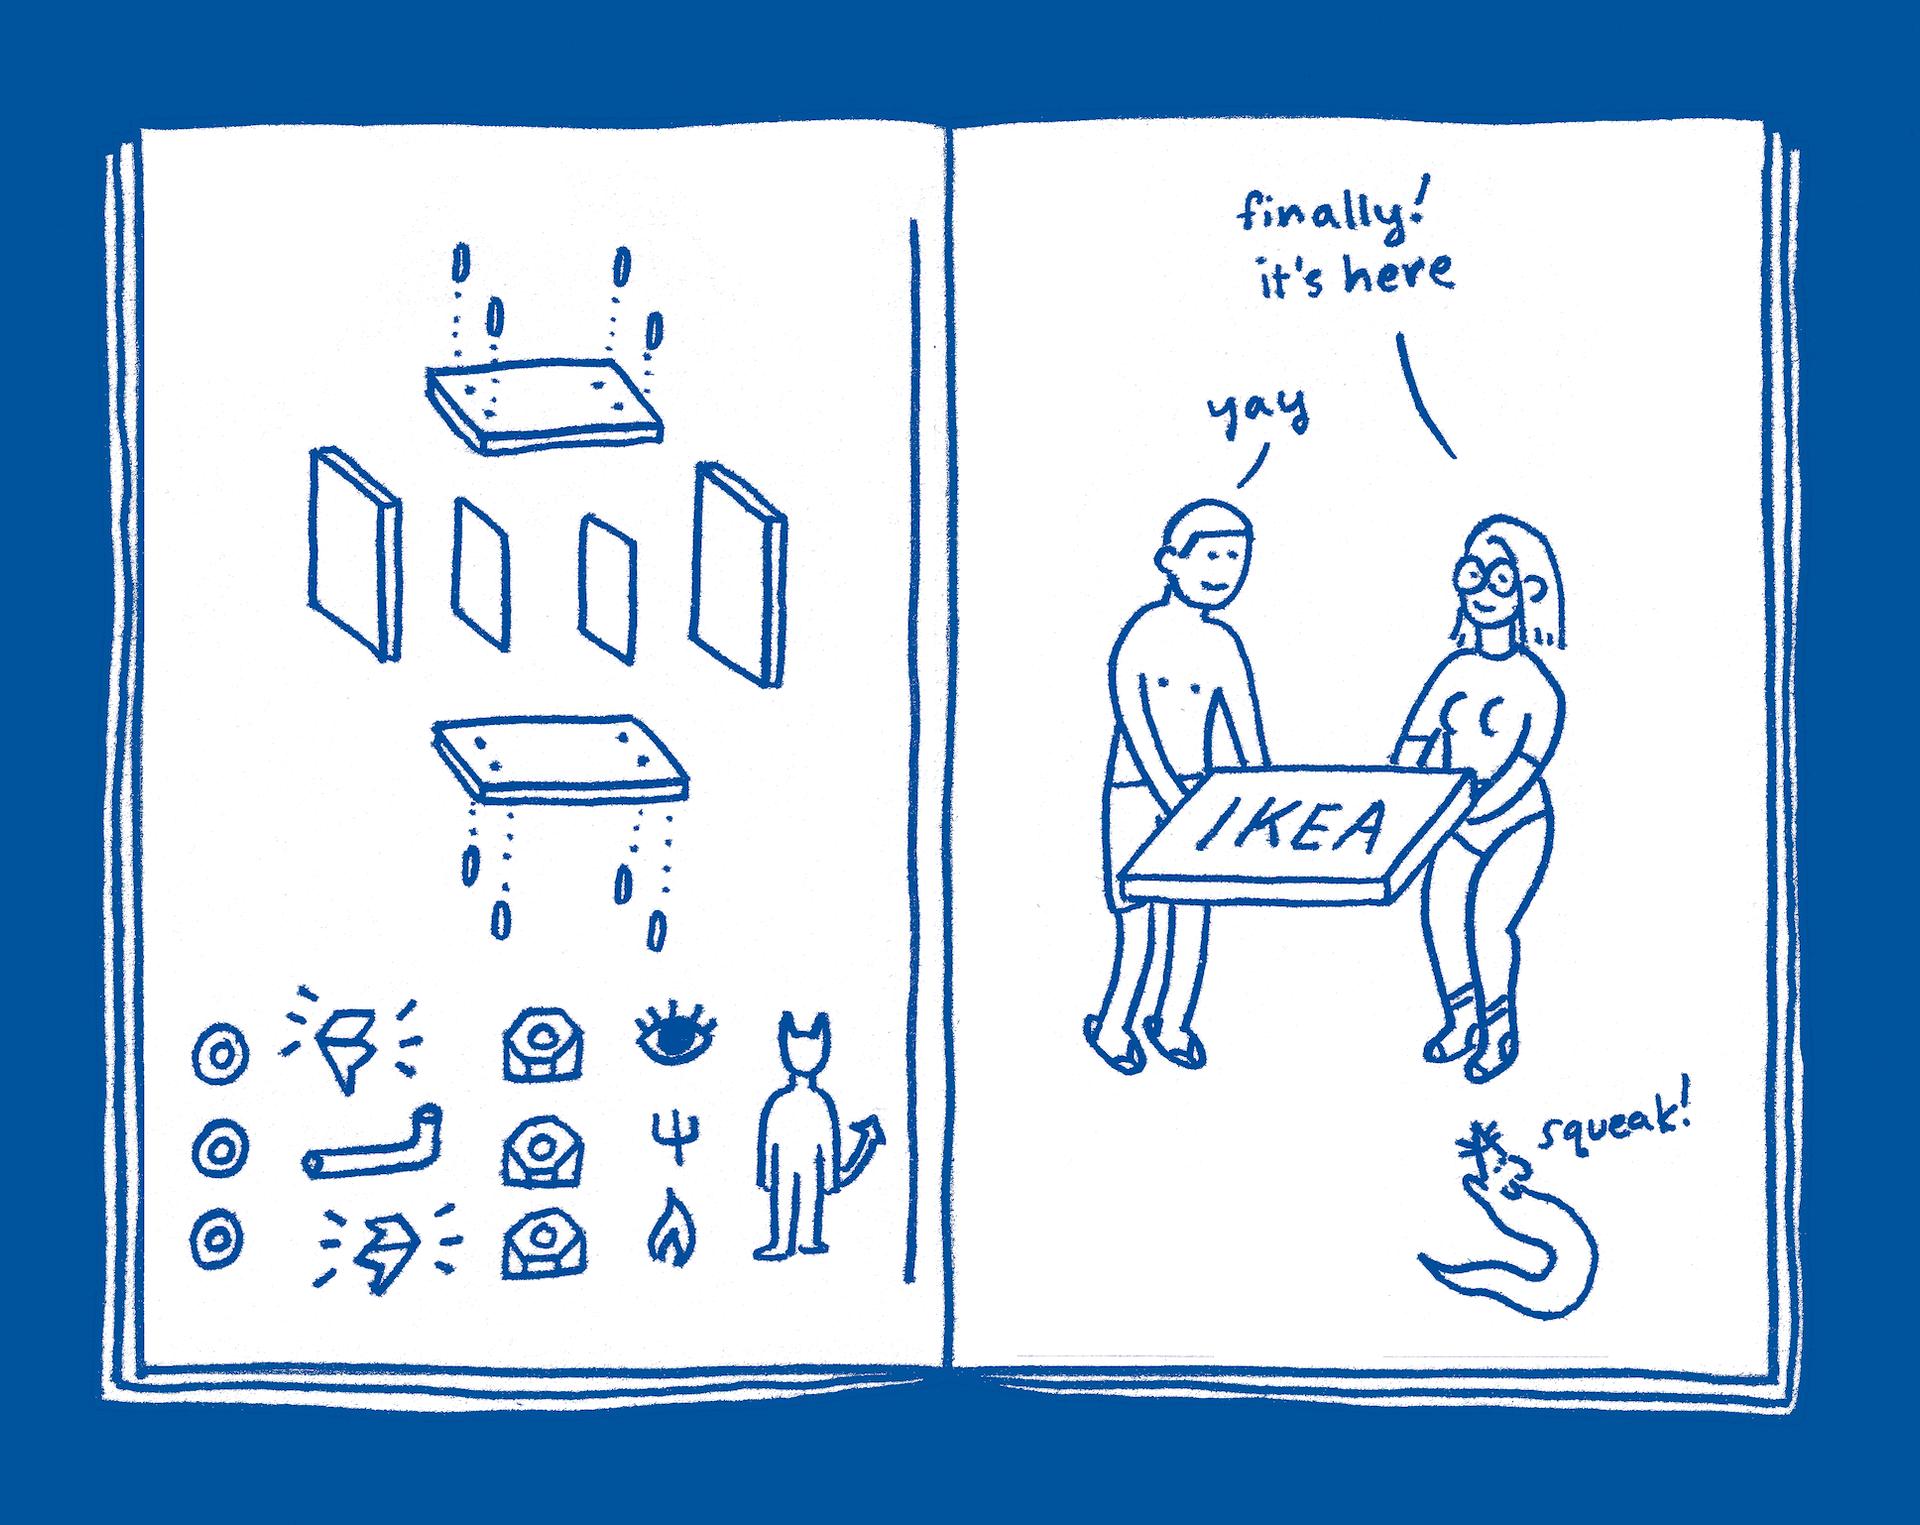 IKEA_drawnpages_600dpi_1-2.png